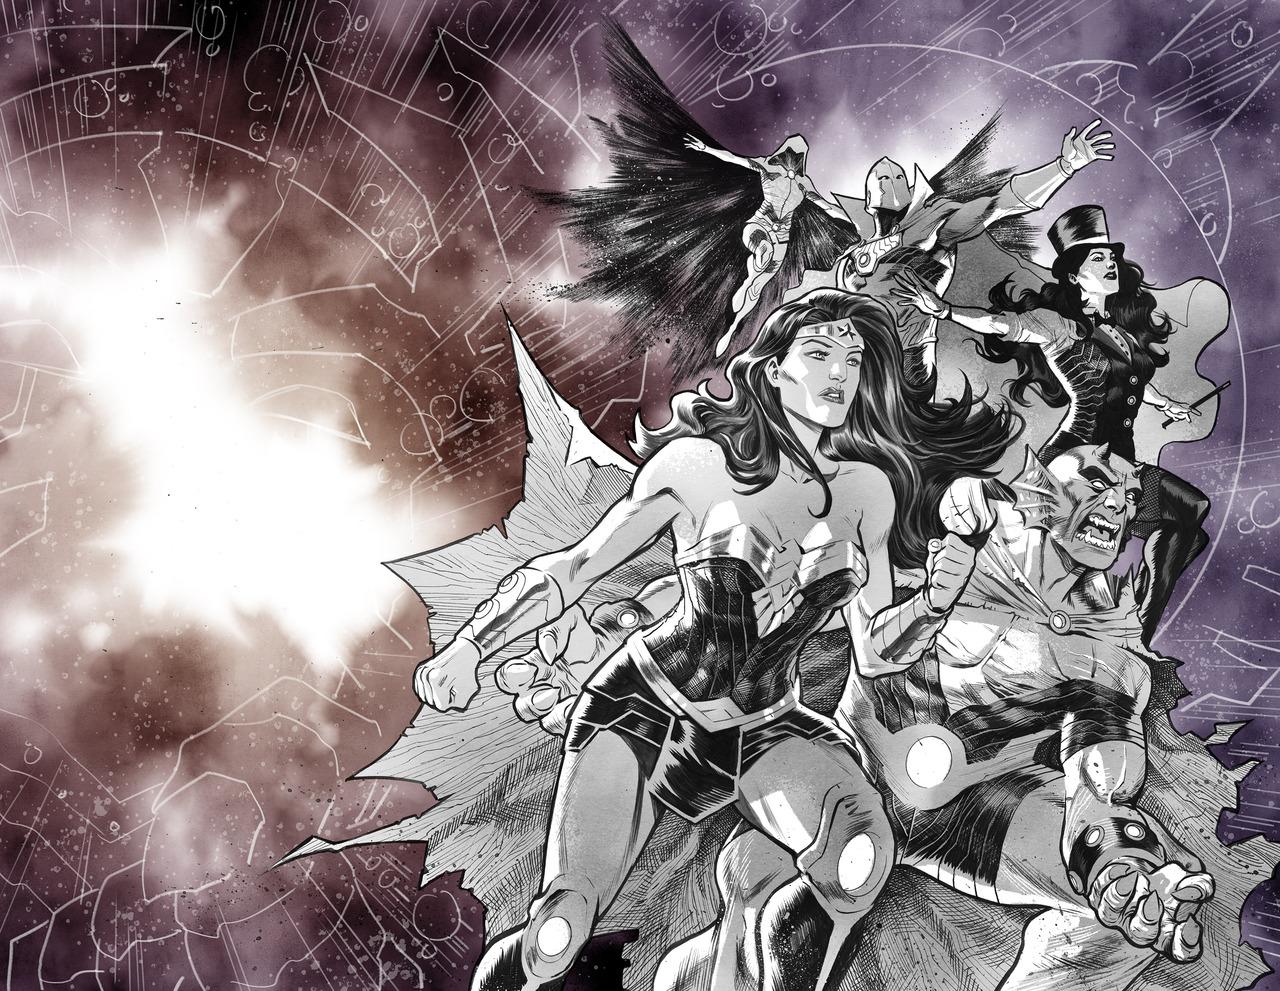 Justice League: No Justice #3 avec la team Wonder, cover par Francis Manapul